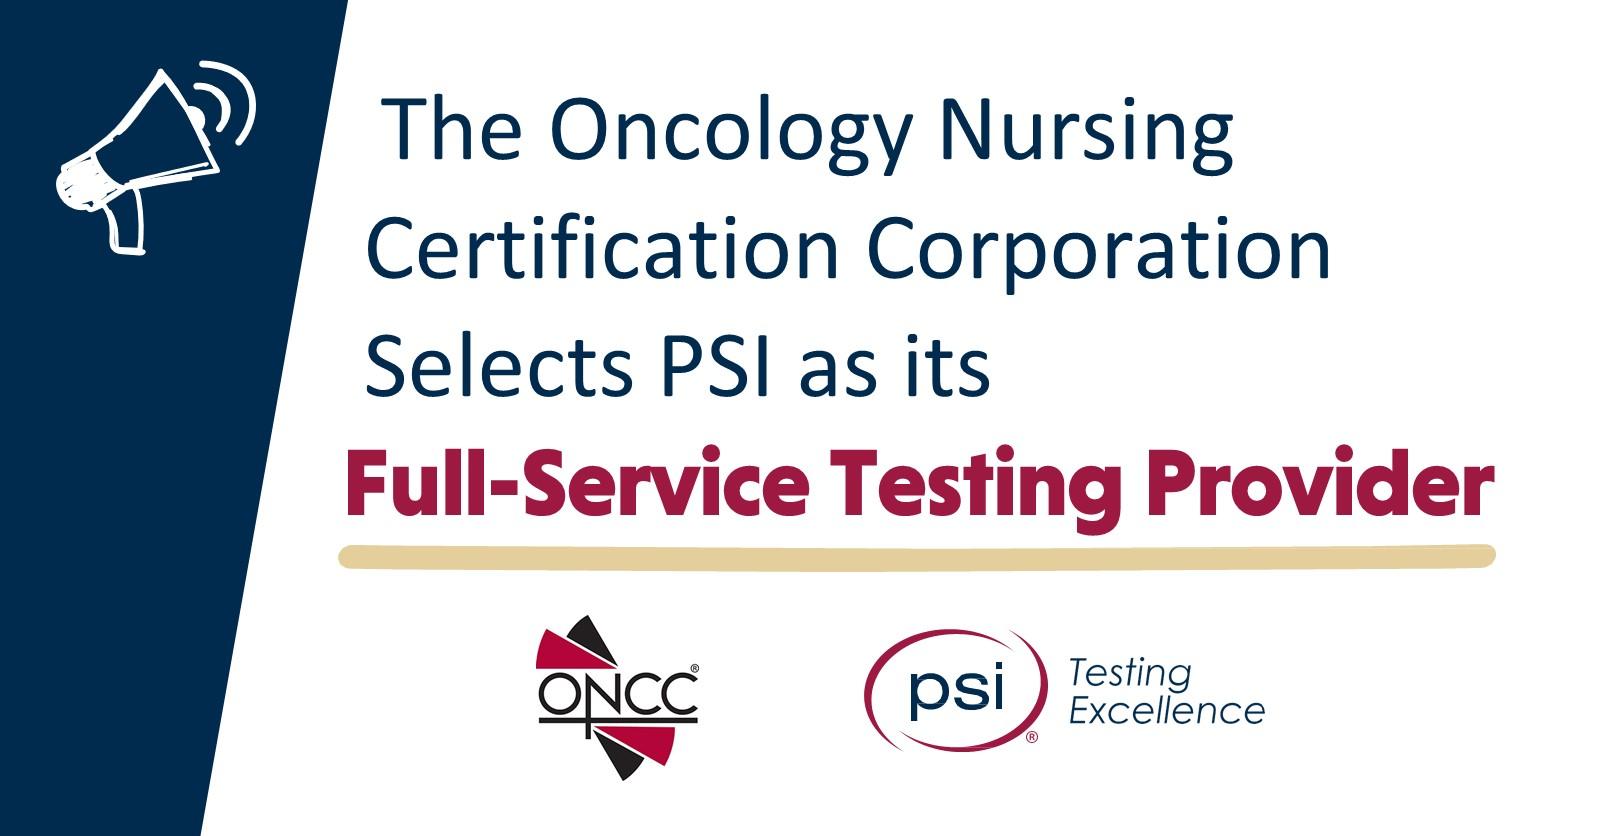 certification oncc oncology nursing corporation psi